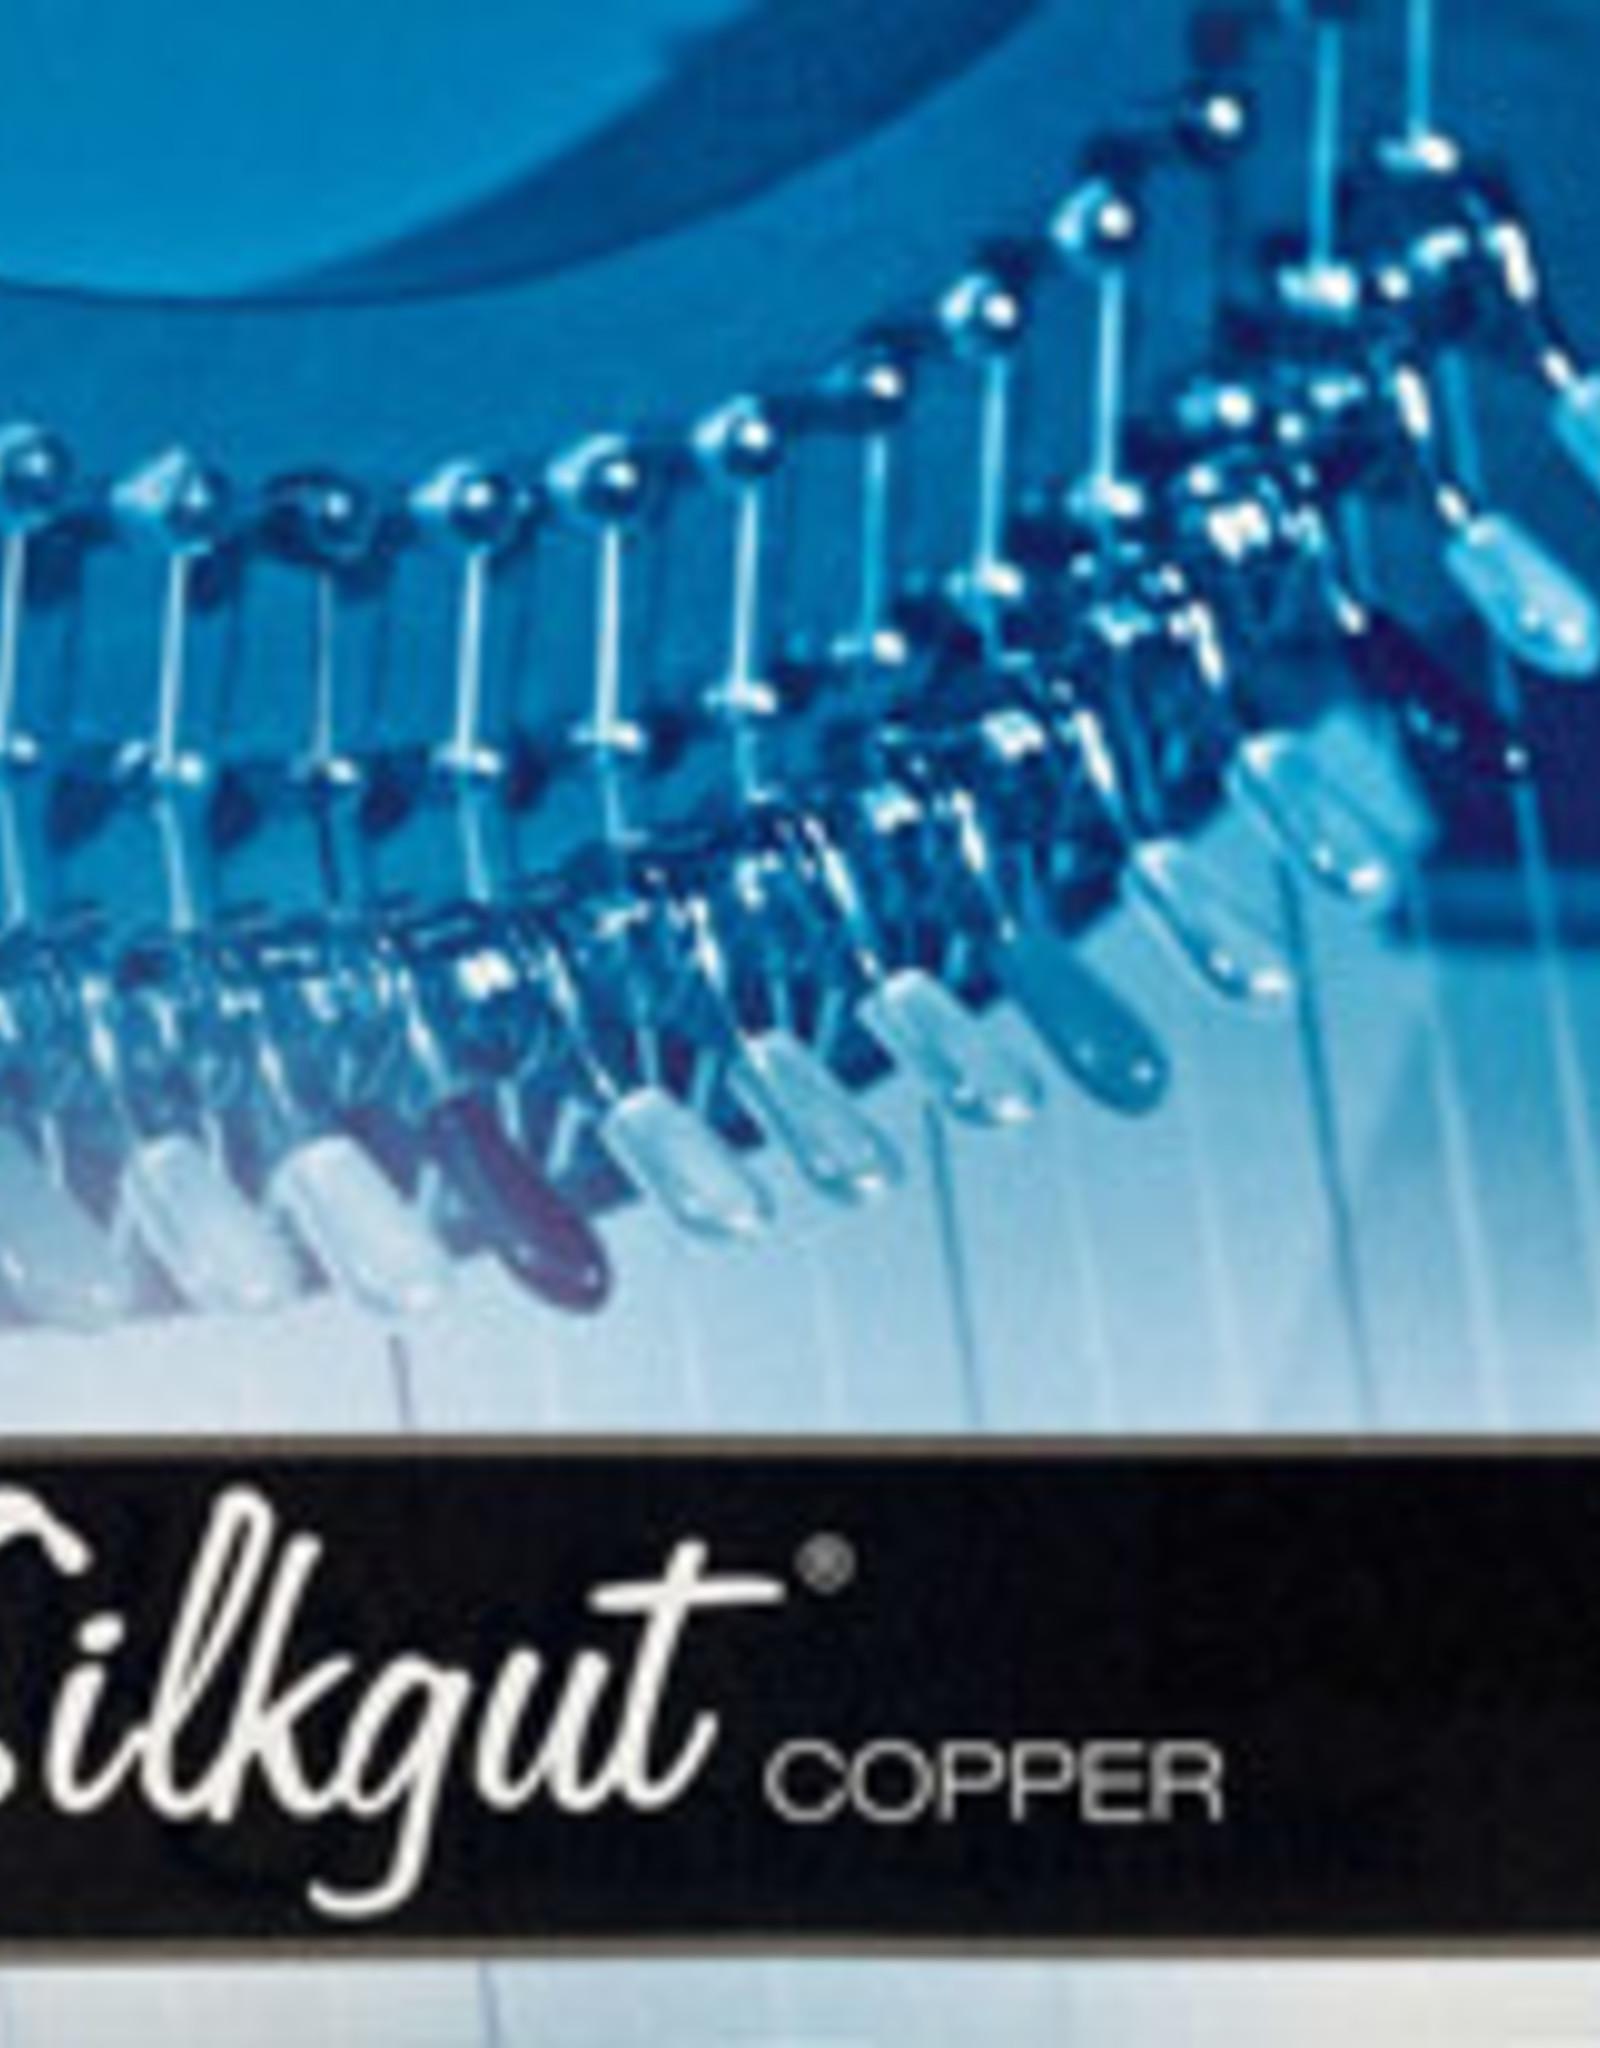 BOW BRAND silkgut copper 25/4si